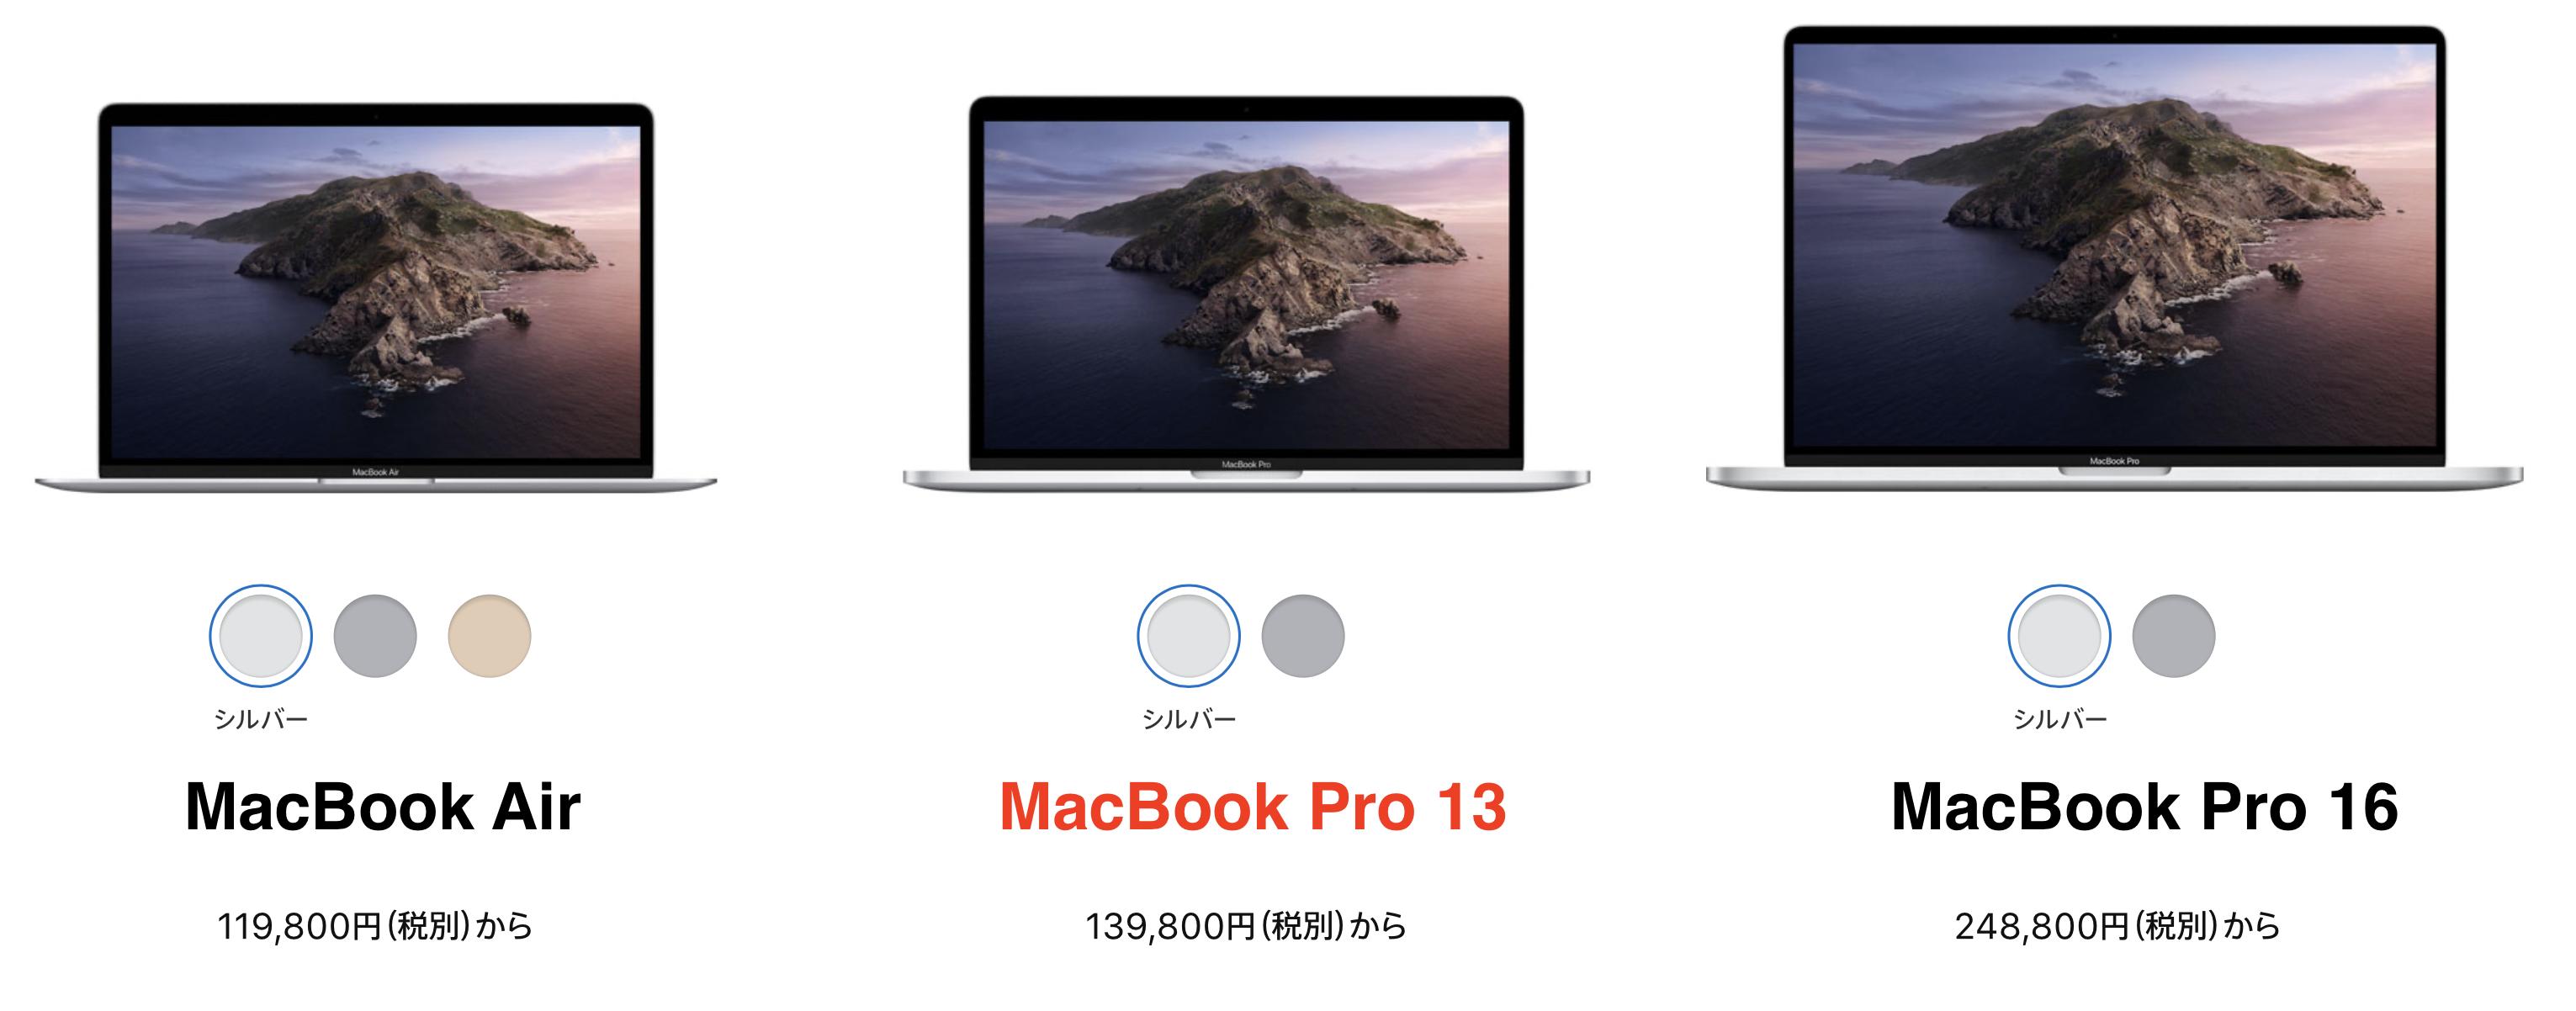 MacBook別価格比較